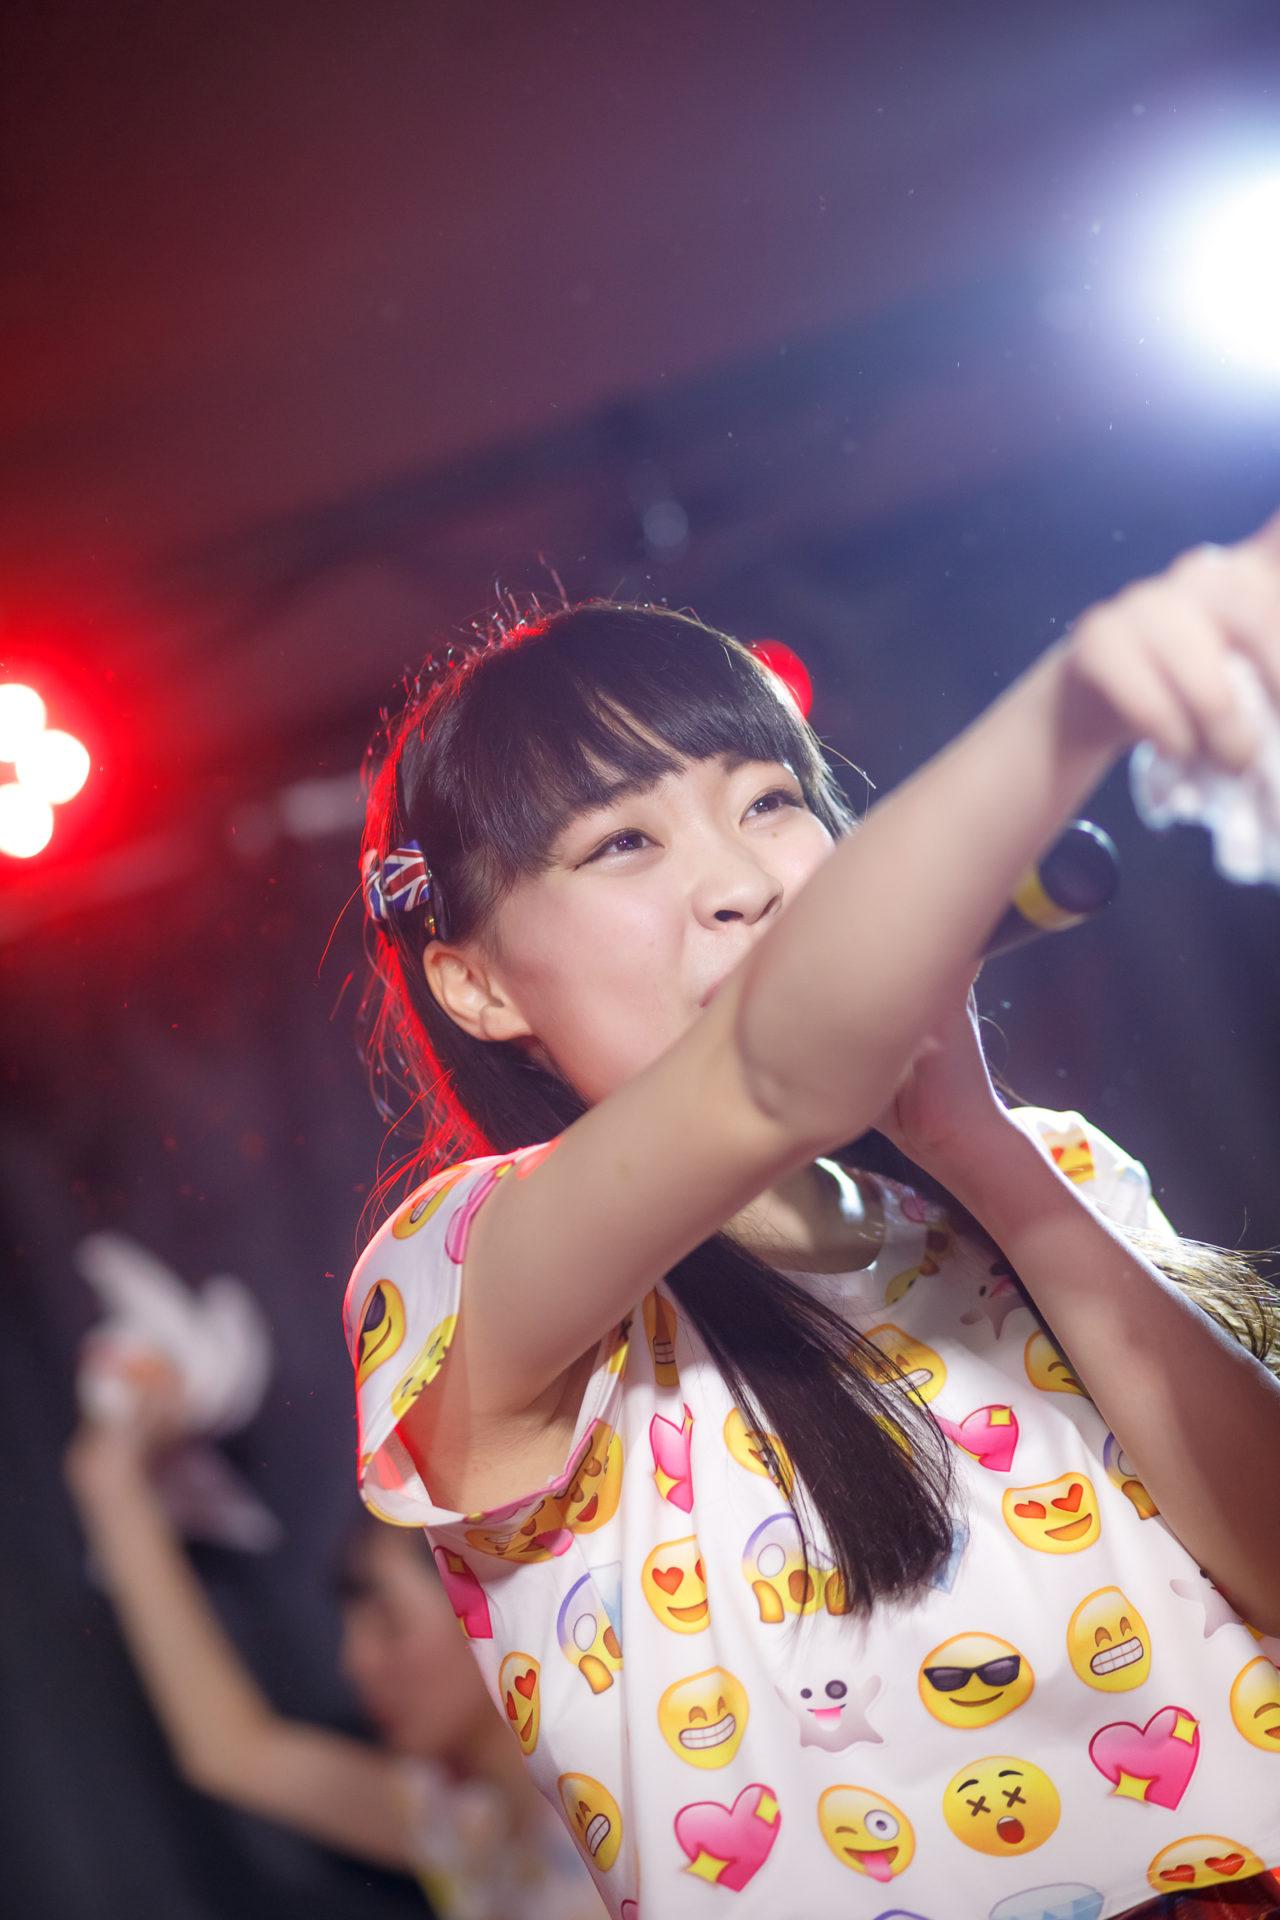 POPPING☆SMILE あゆり ( 福山愛由梨 ) | 苗の木LIVE Vol.27 ~お賽銭LIVE 春の陣~